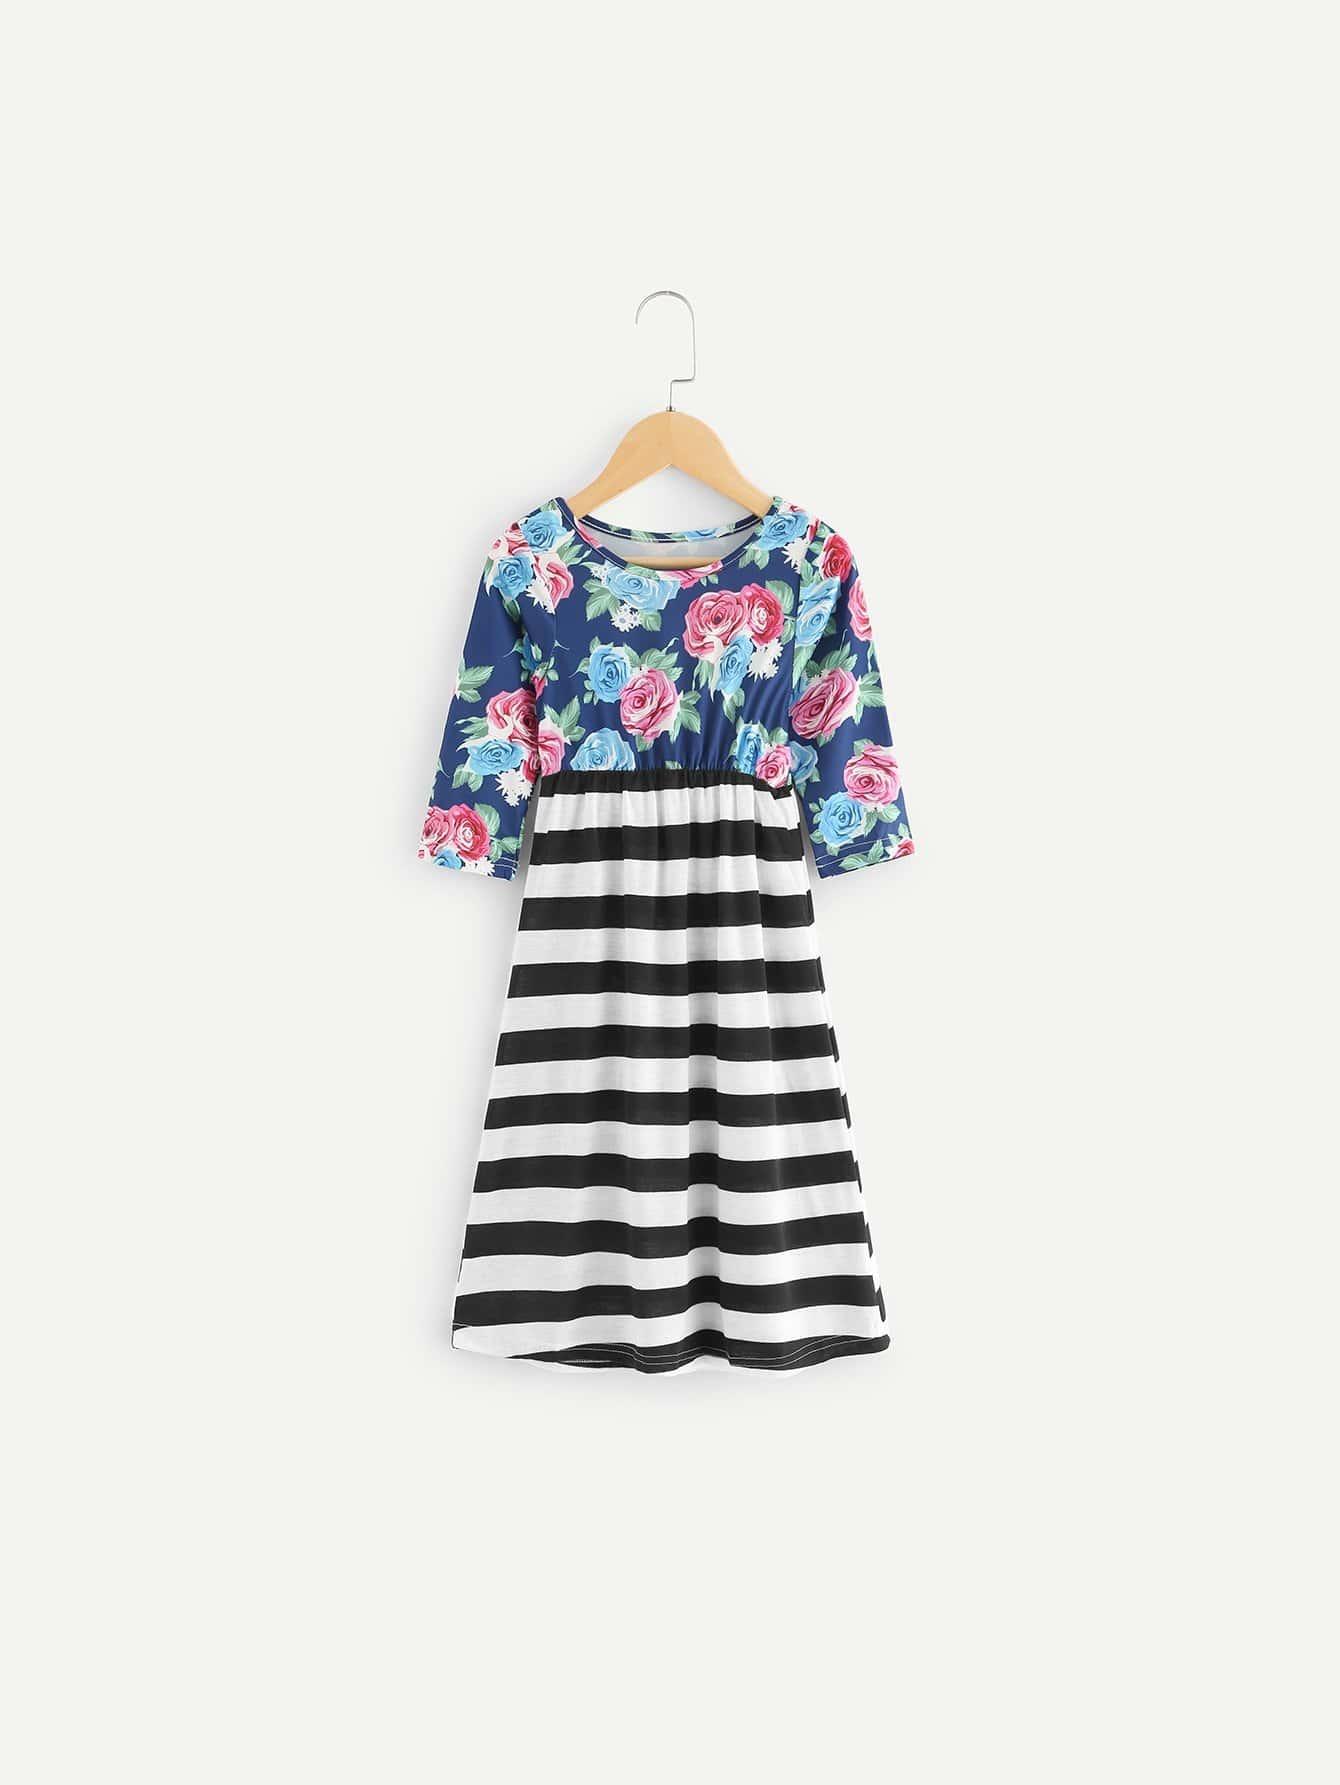 Kids Contrast Striped Floral Print Dress contrast lace striped star print dress